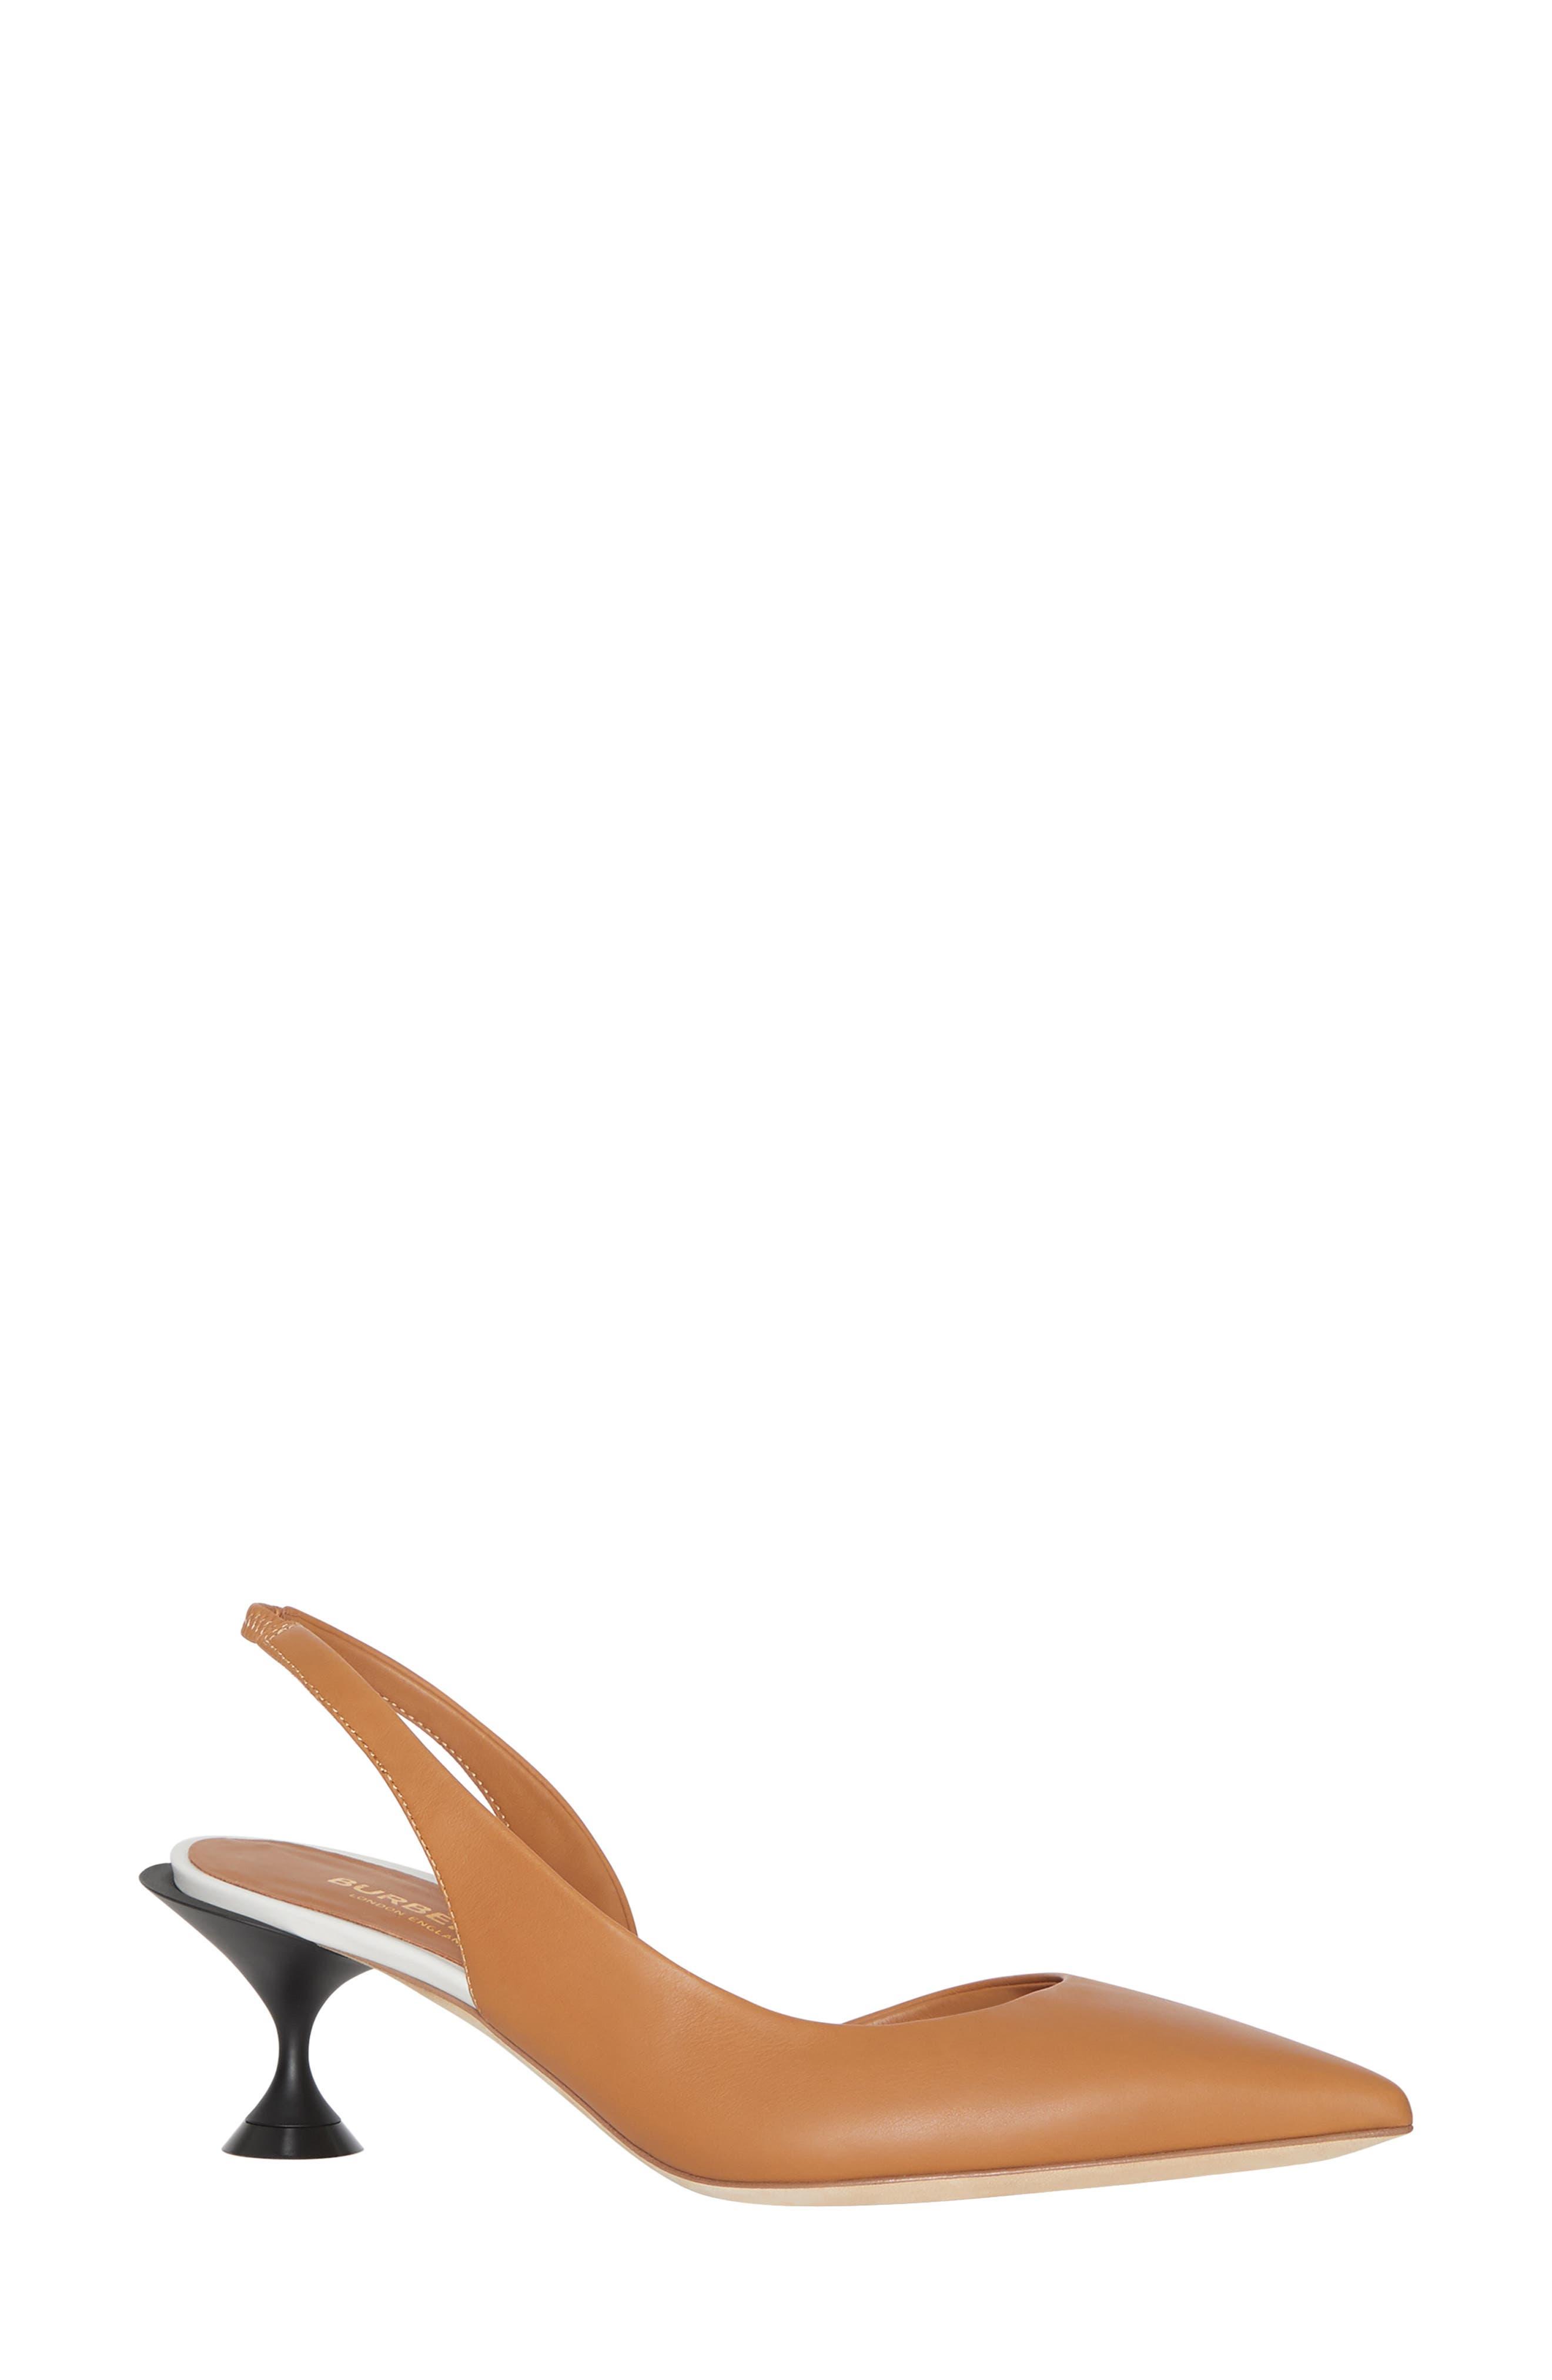 BURBERRY, Leticia Check Slingback Pump, Main thumbnail 1, color, CAMEL